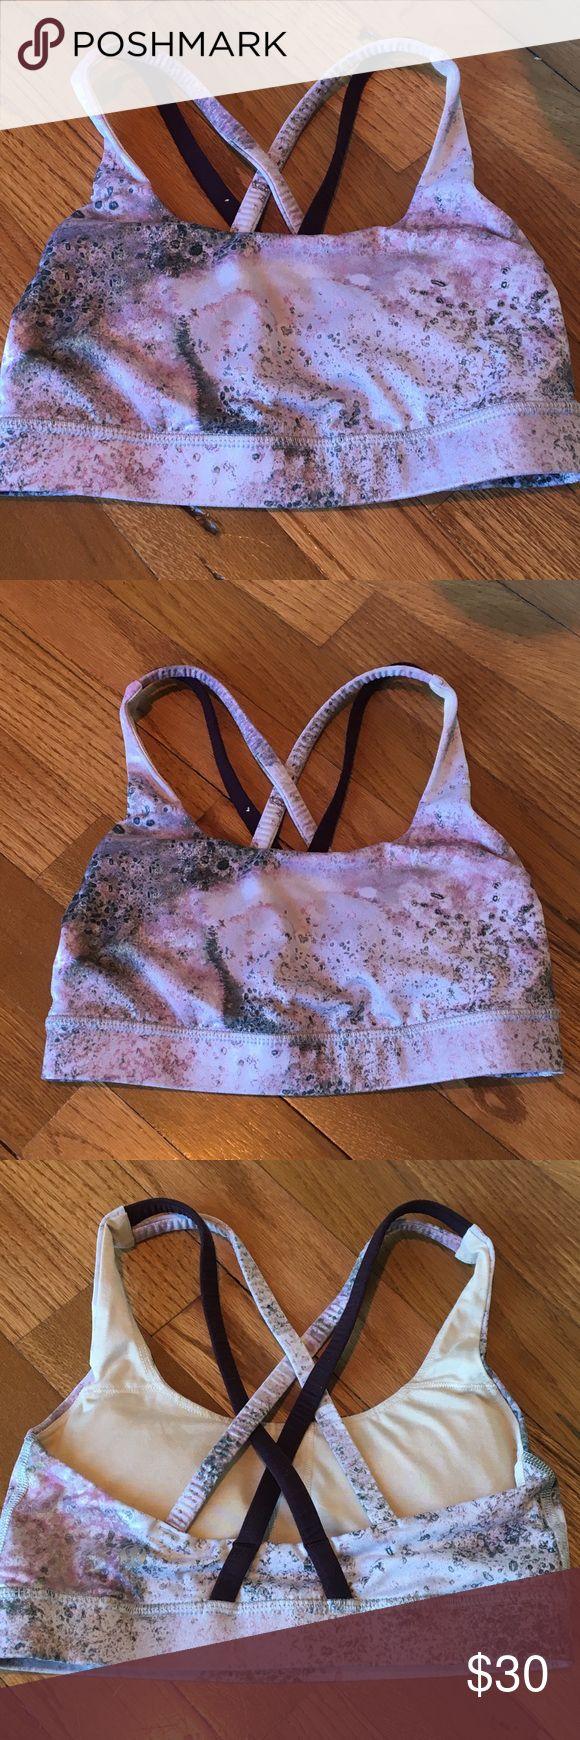 Lululemon sport bra Pink and black splatter pattern sports bra. Adorable and shows no signs of wear! lululemon athletica Intimates & Sleepwear Bras